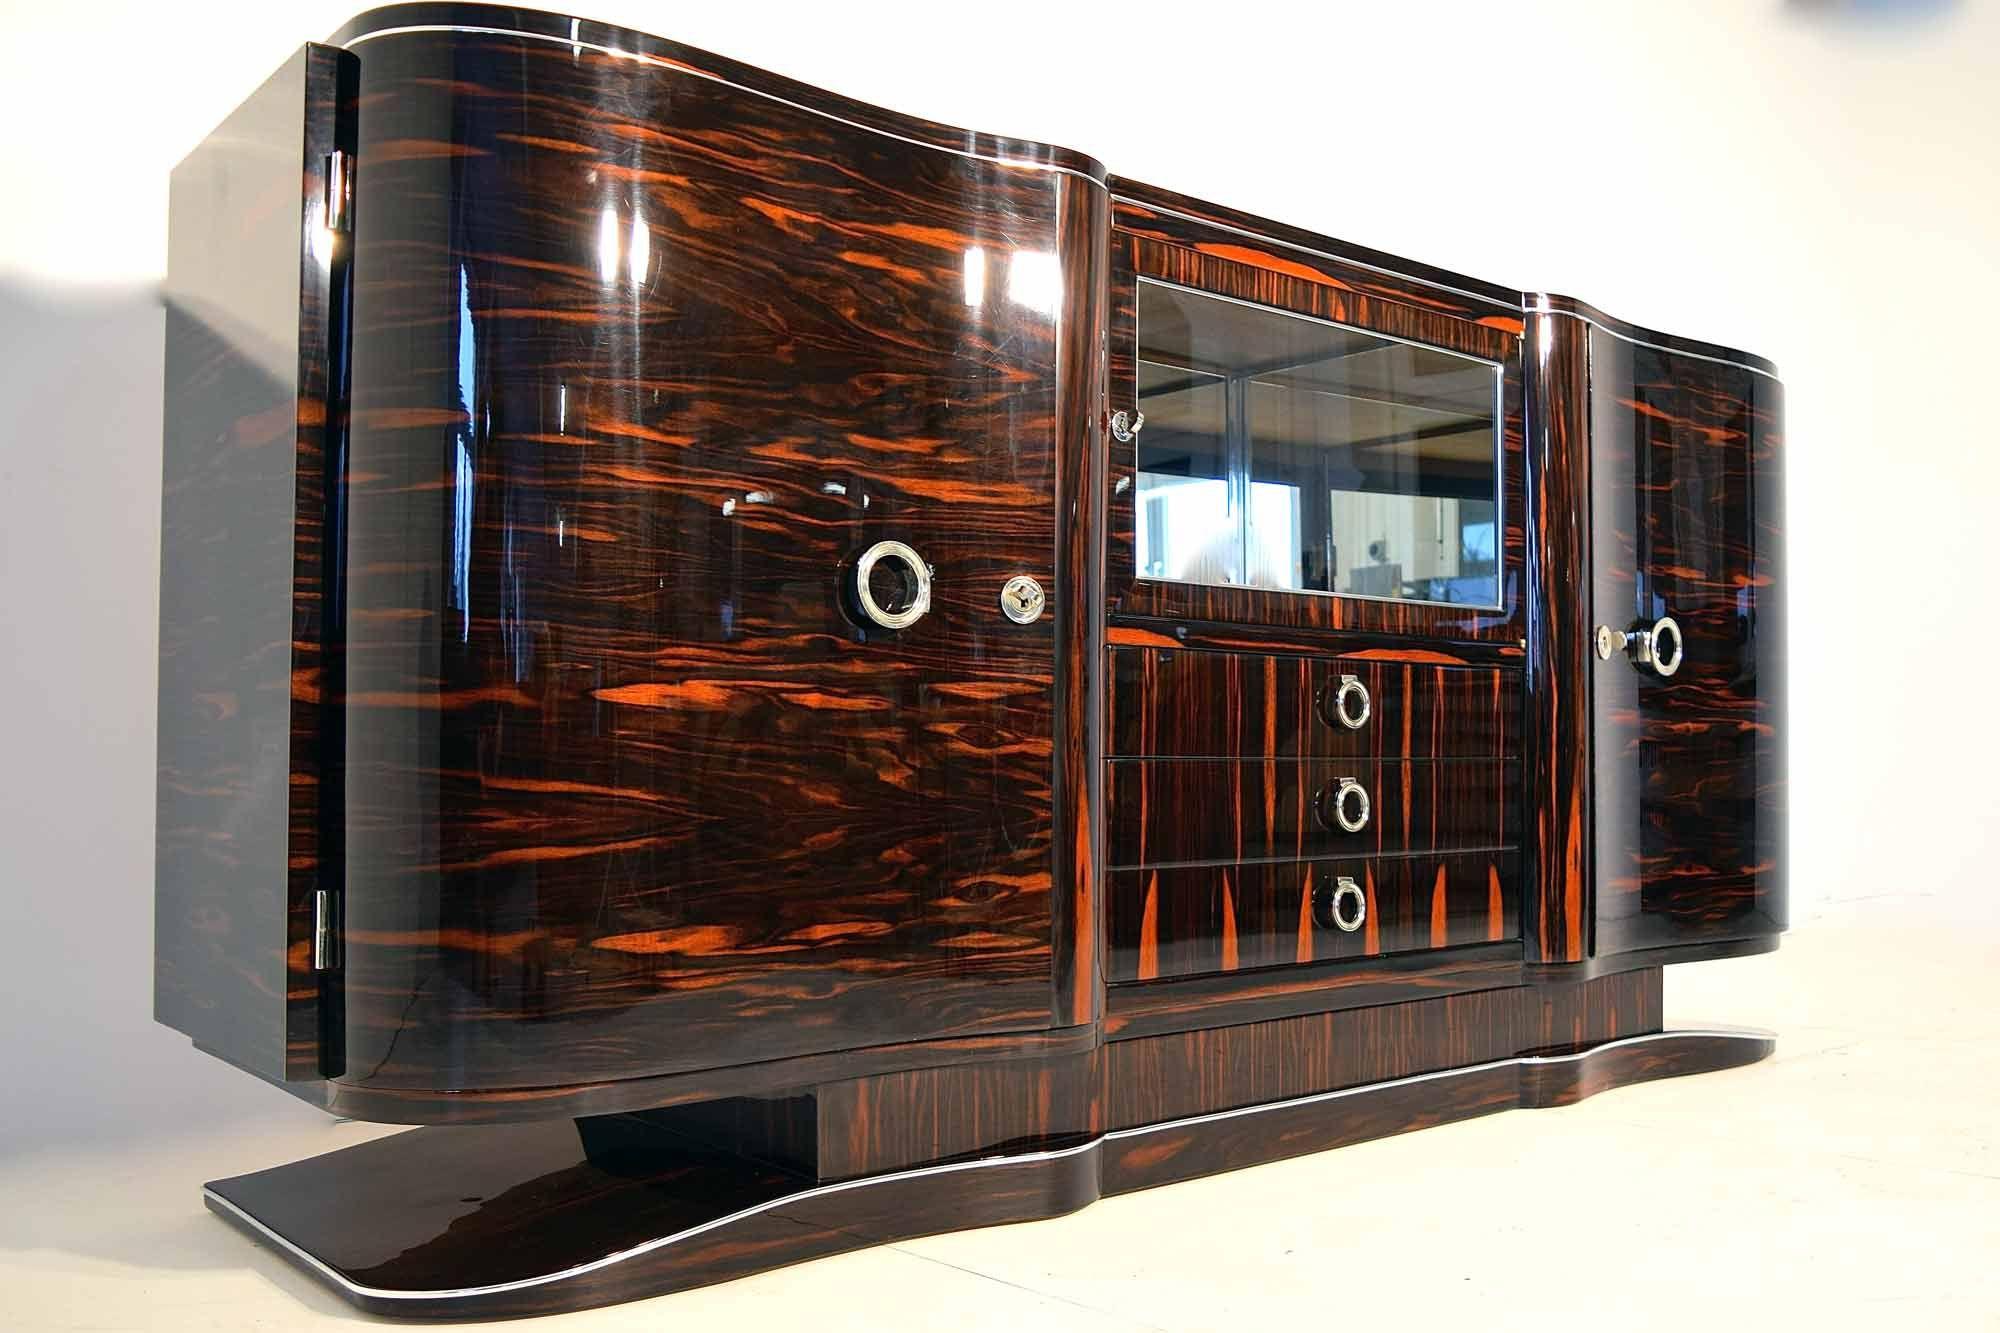 Art Deco Sideboard Makassar B235xh98xt55 Artdeco Depot Art Deco Sideboard Art Deco Furniture Design Art Deco Buildings